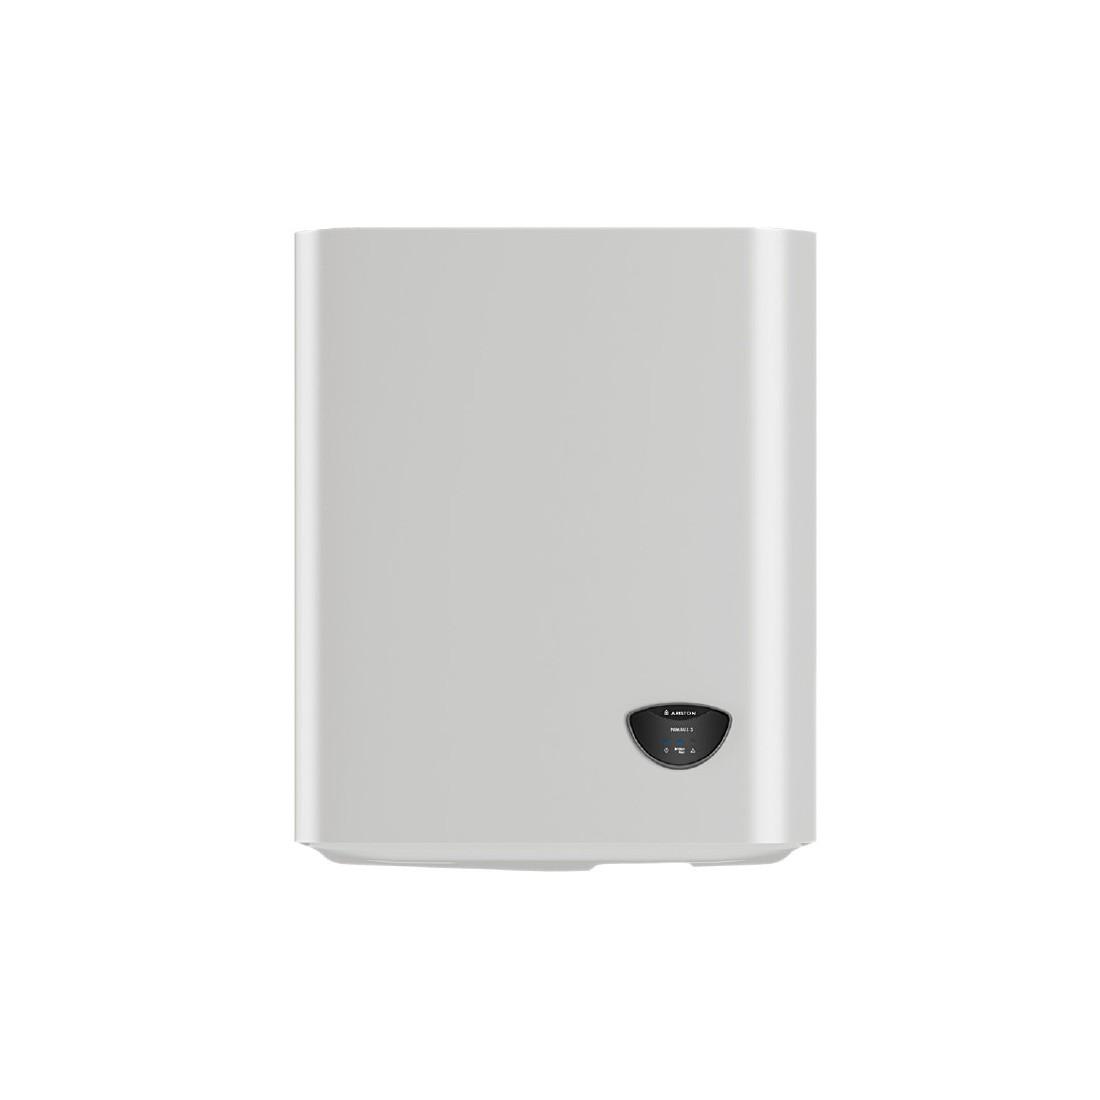 Šilumos siurblys Oras-Vanduo Ariston Nimbus, Flex, 90 S Net 14 kW Φ3, su 180 (177 l) vandens šildytuvu ir Wi-Fi